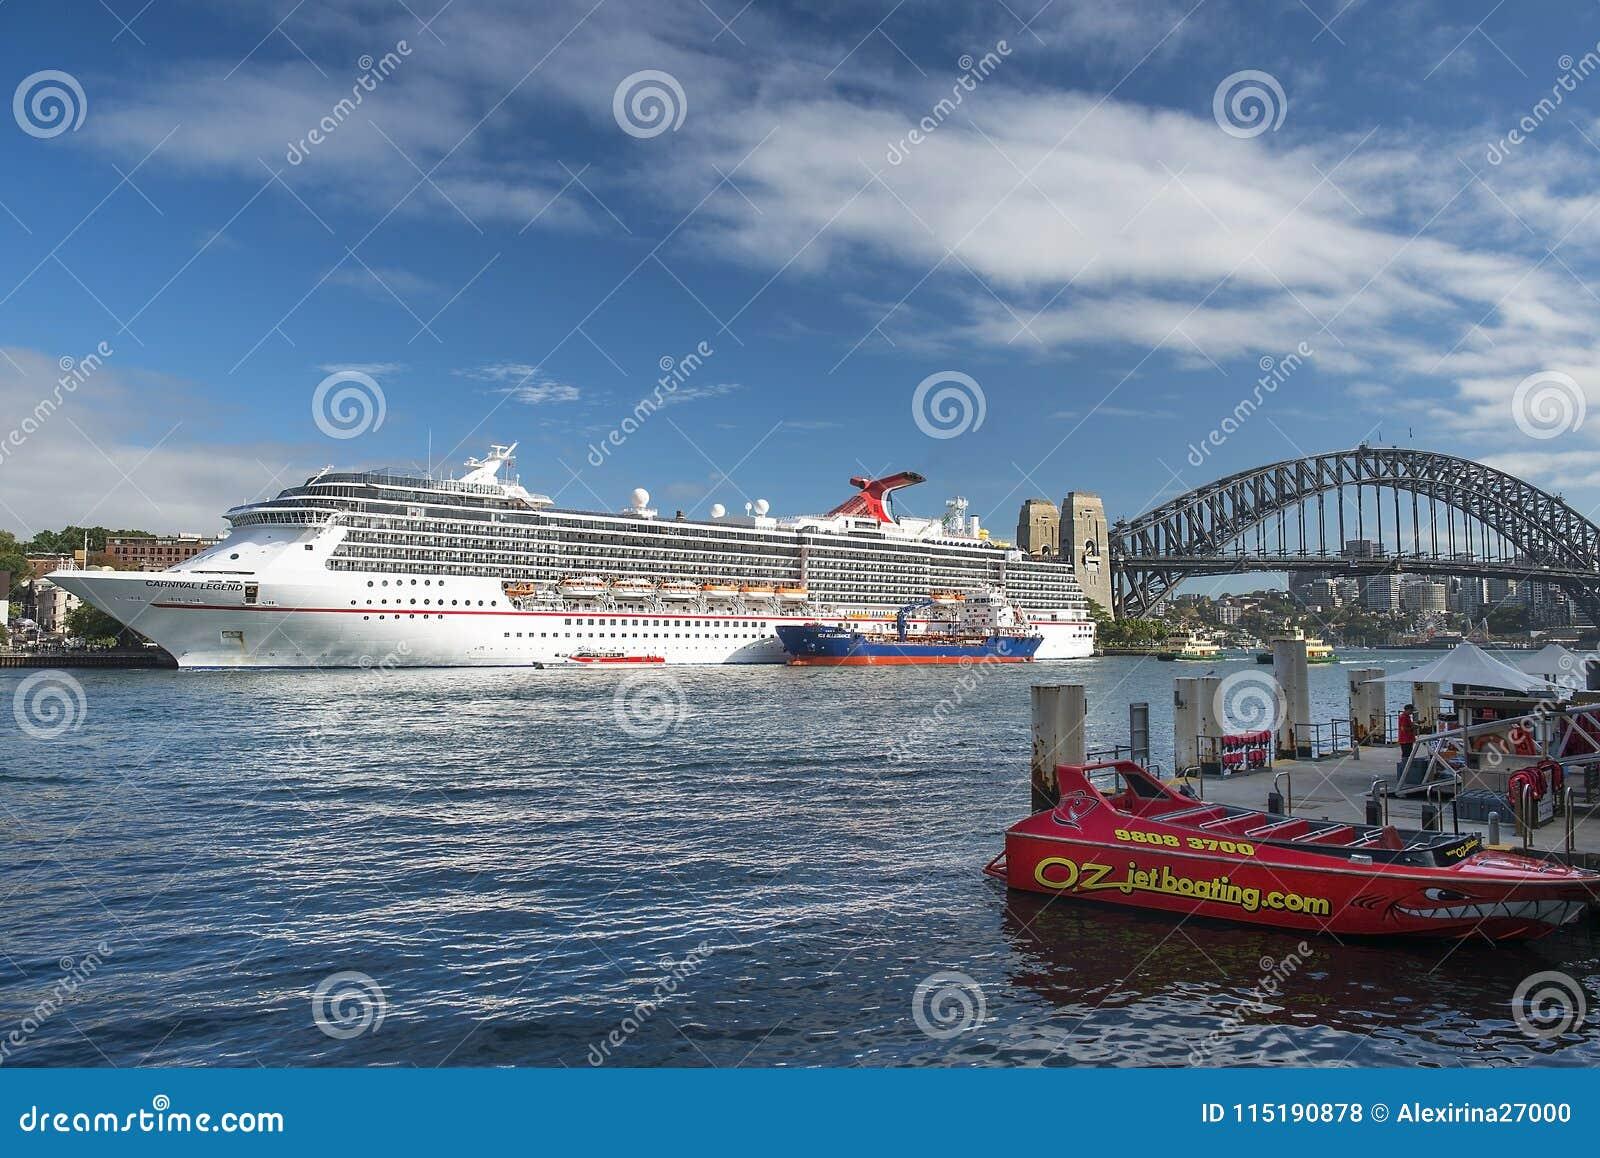 Cruise liner Carnival Legend parked in the Sydney Harbour, Sydney, Australia